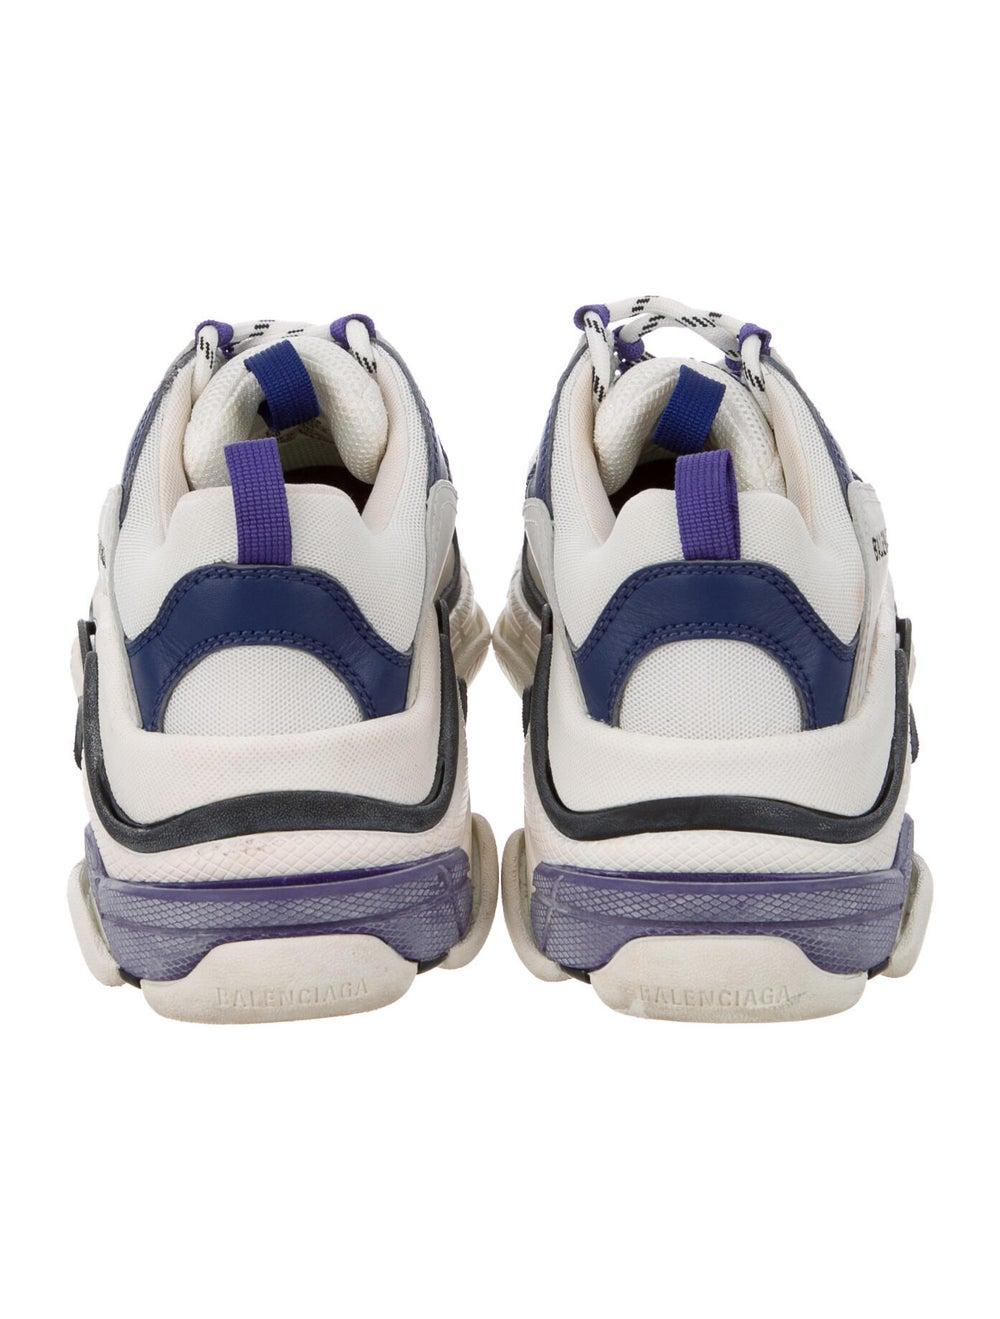 Balenciaga Triple S Chunky Sneakers Blue - image 4